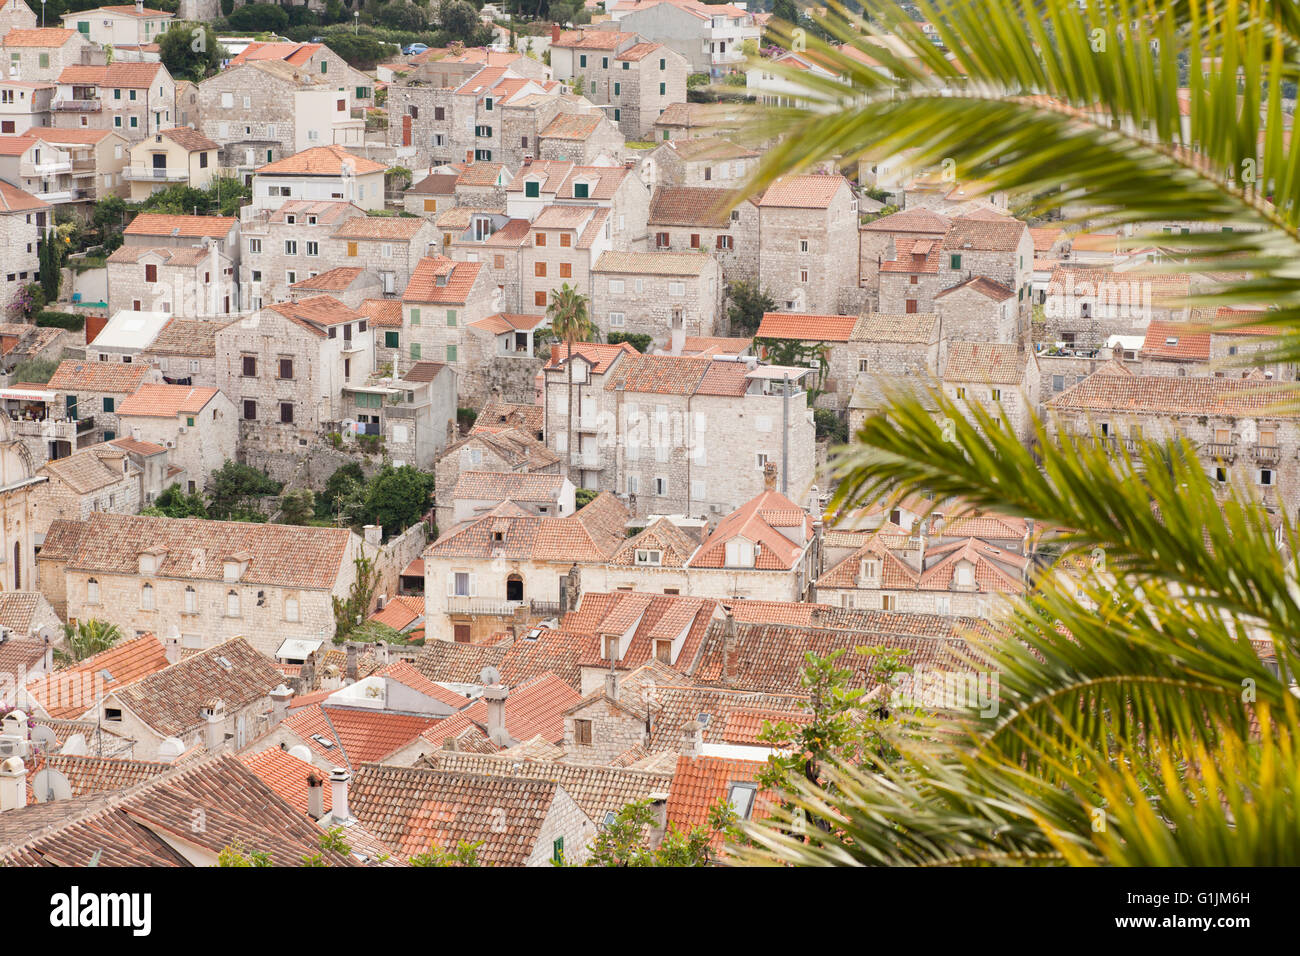 View of the city of Hvar, Croatia. - Stock Image